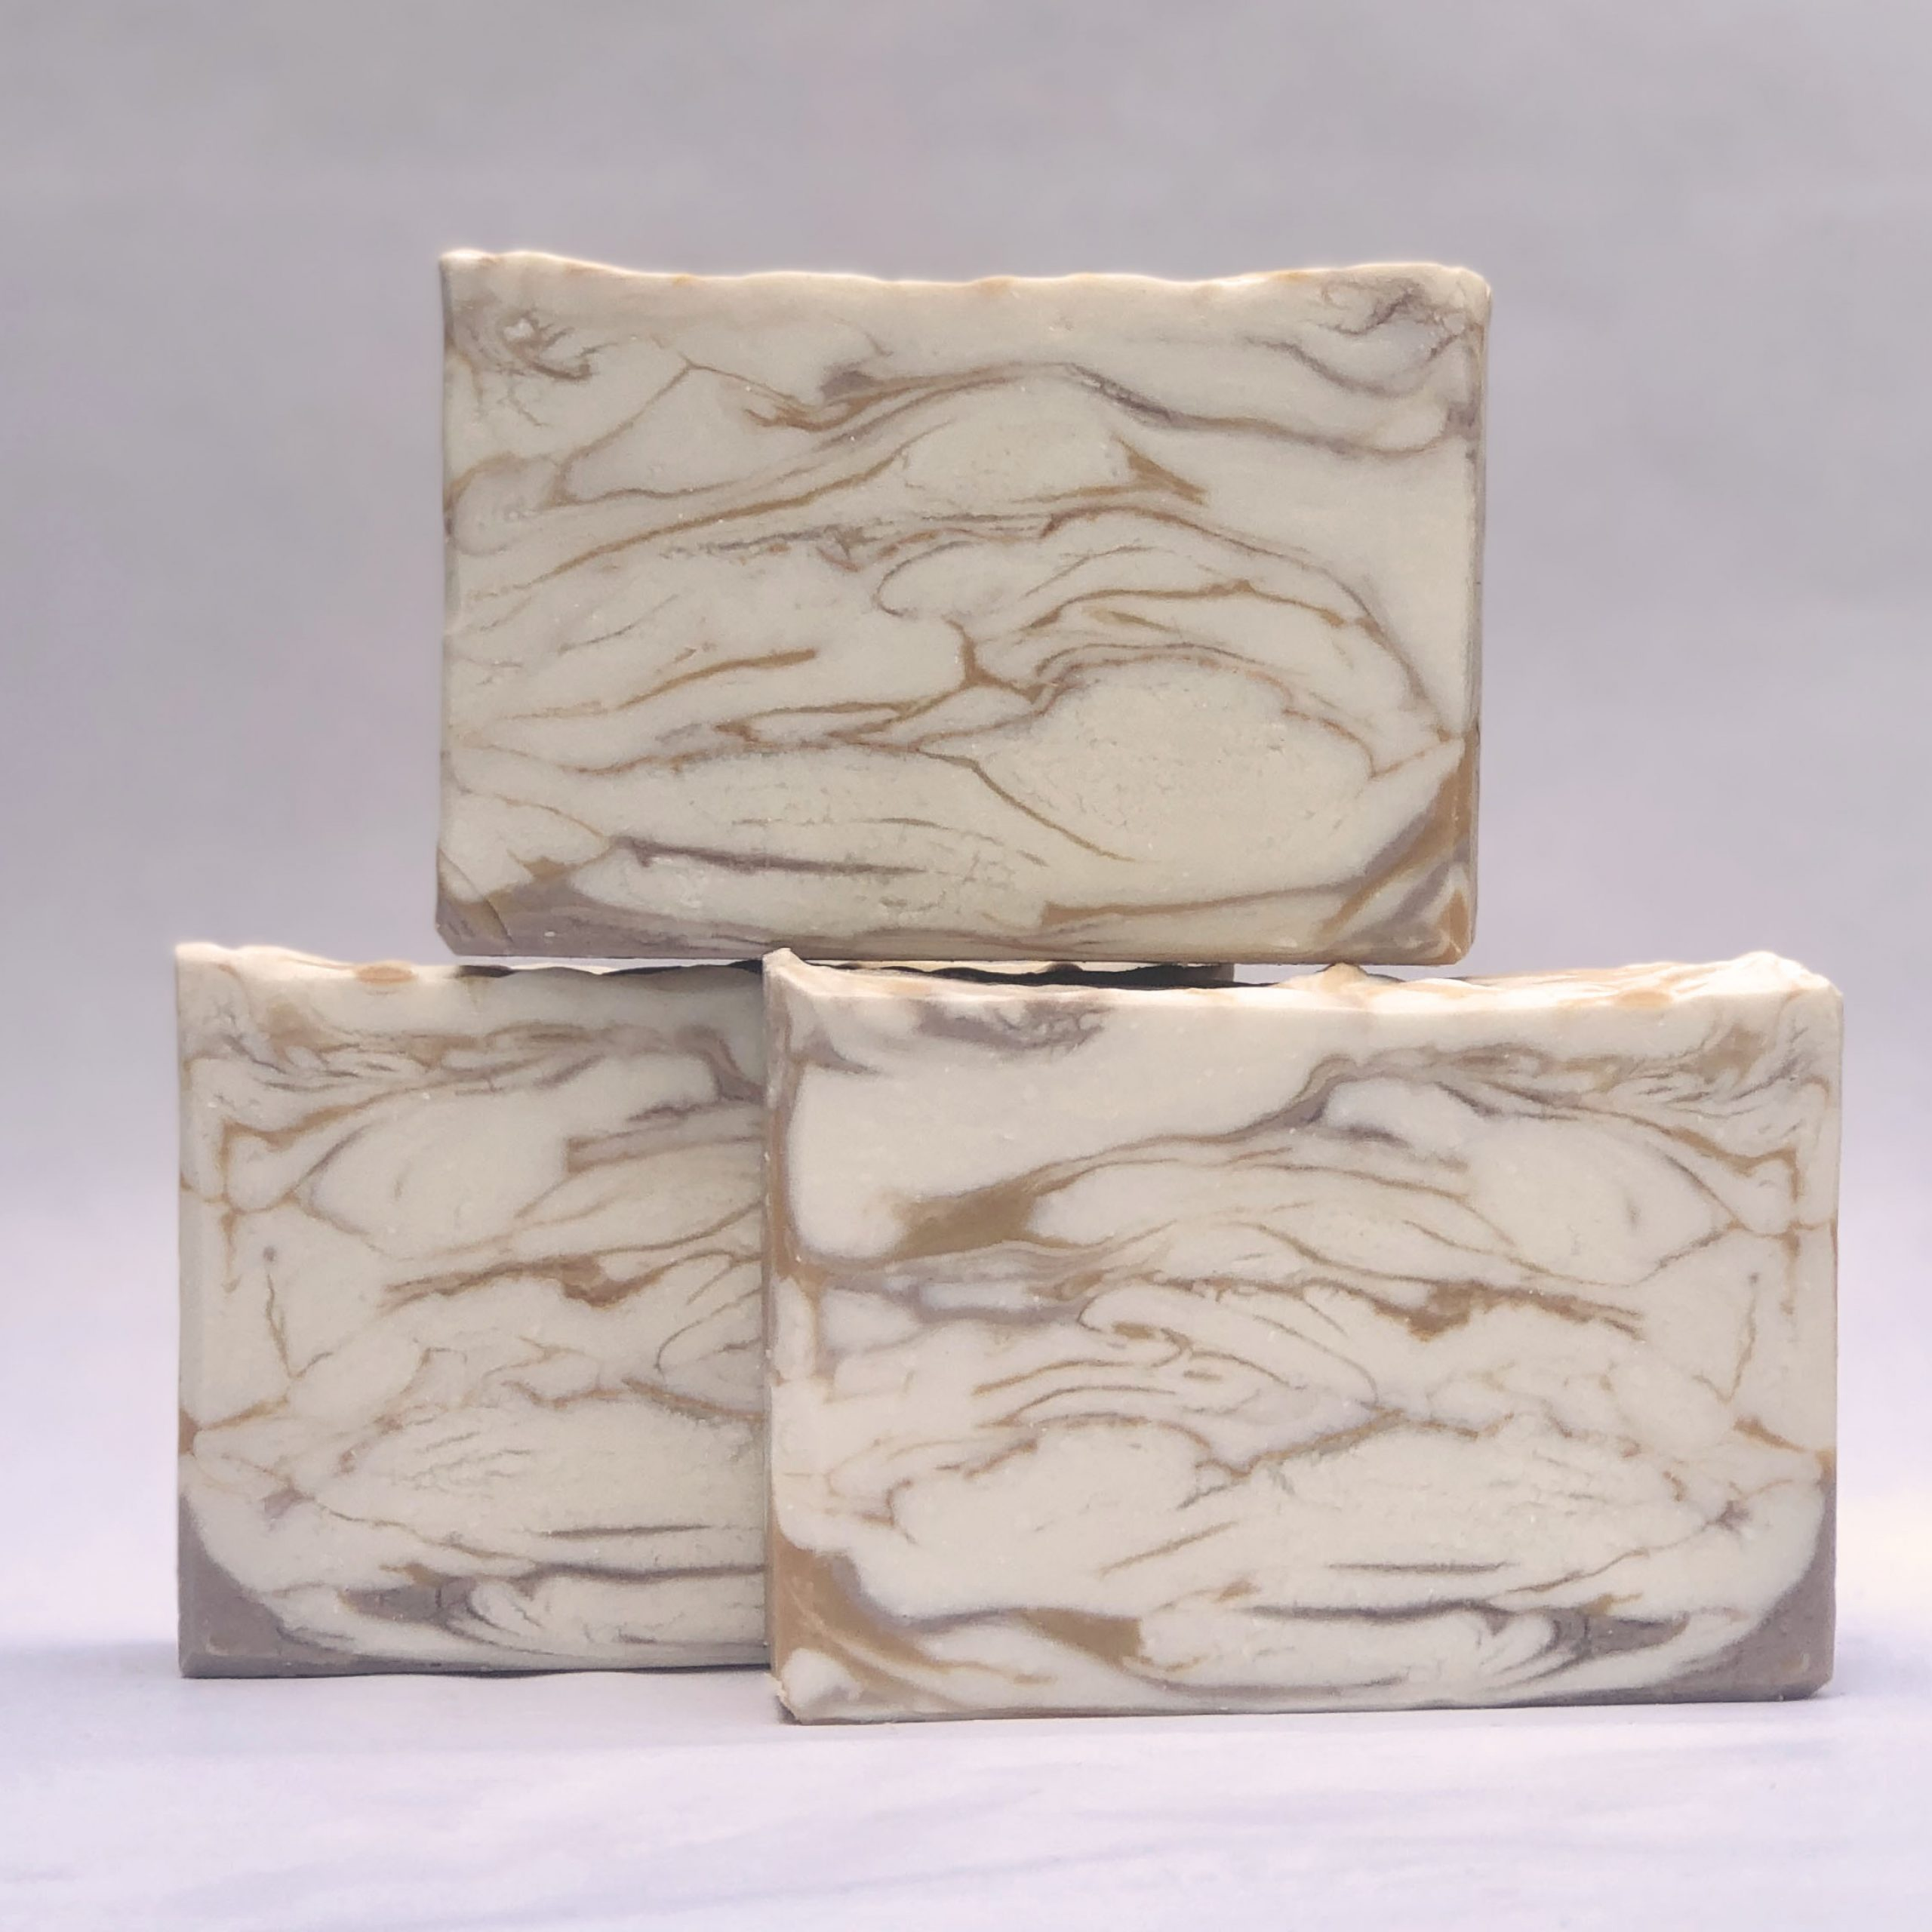 acropolis marbles